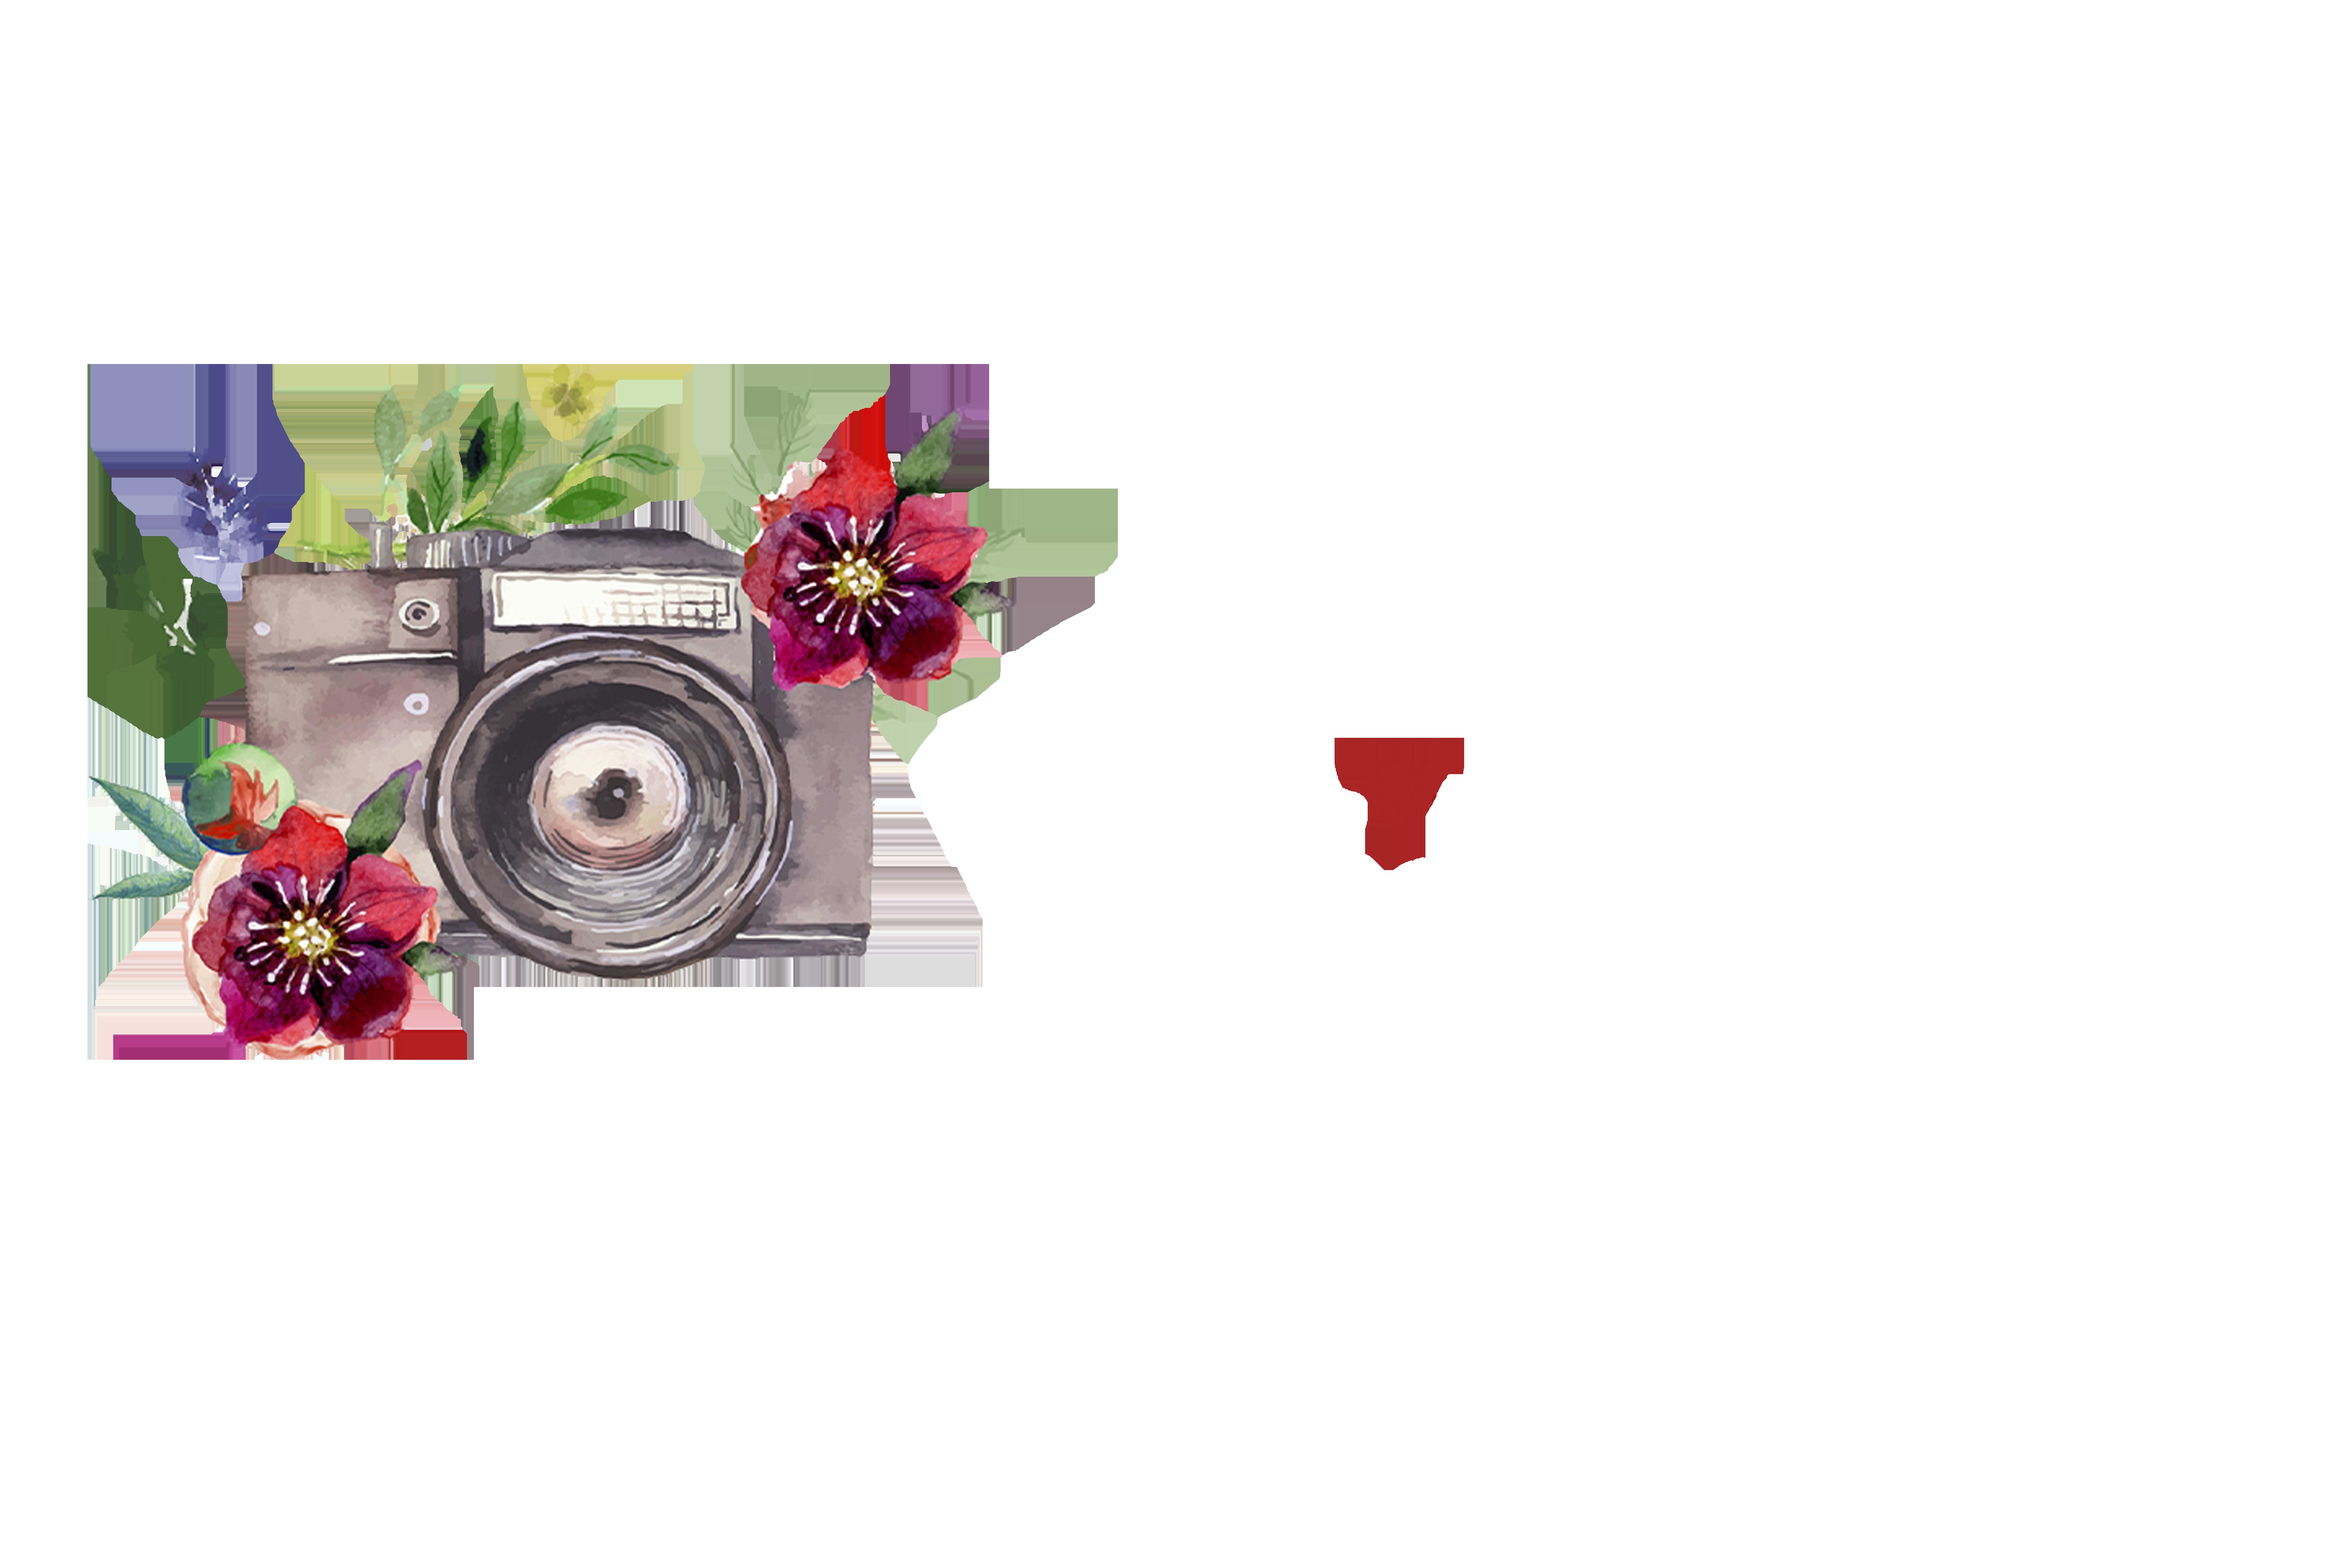 PRECIOUS MOMENTS PHOTOGRAPHY AND MEDIA